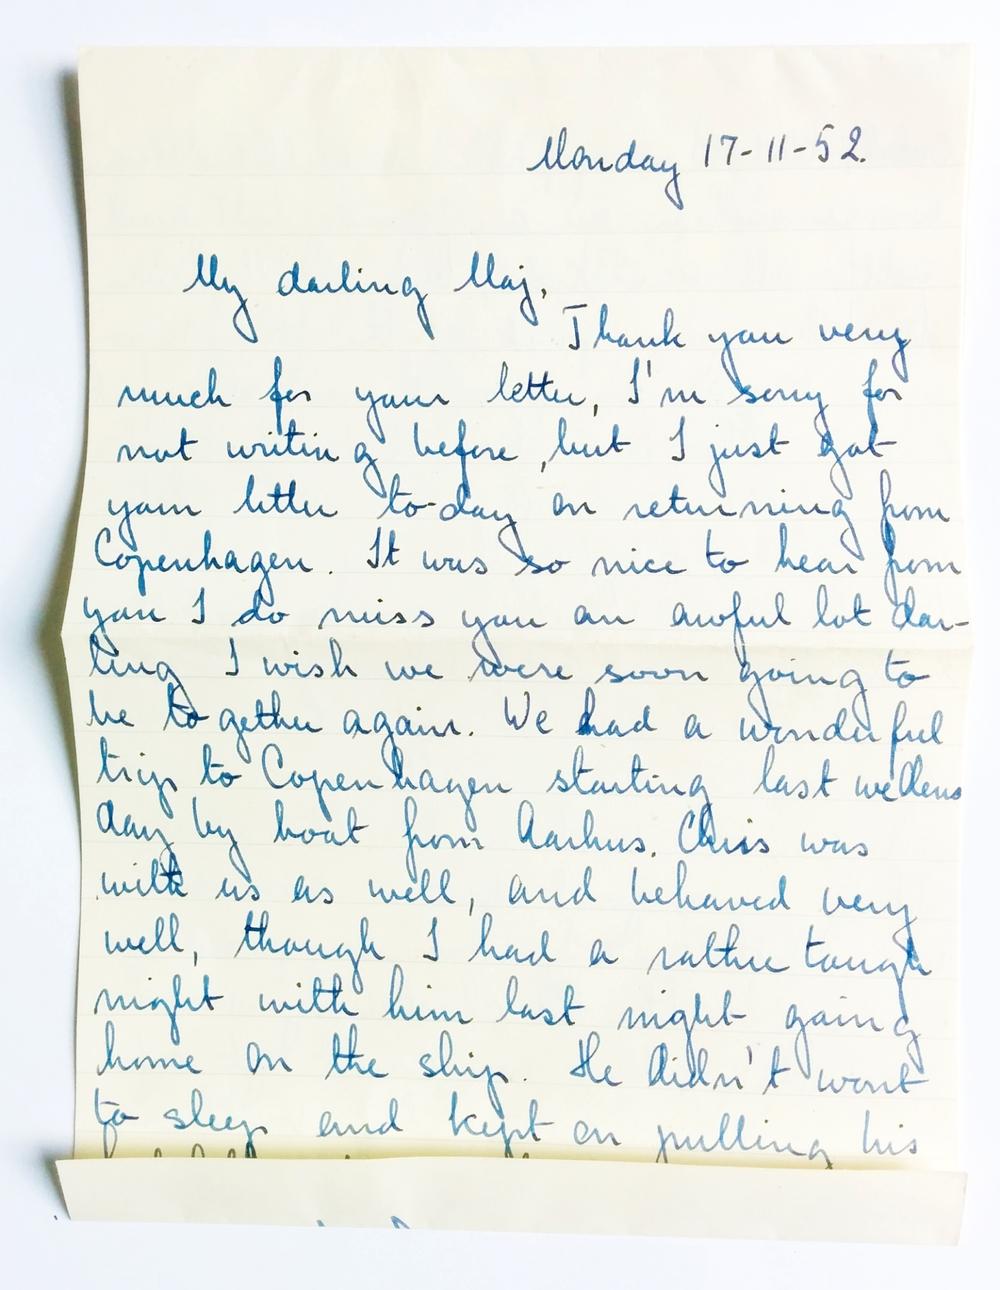 November 17th, 1952